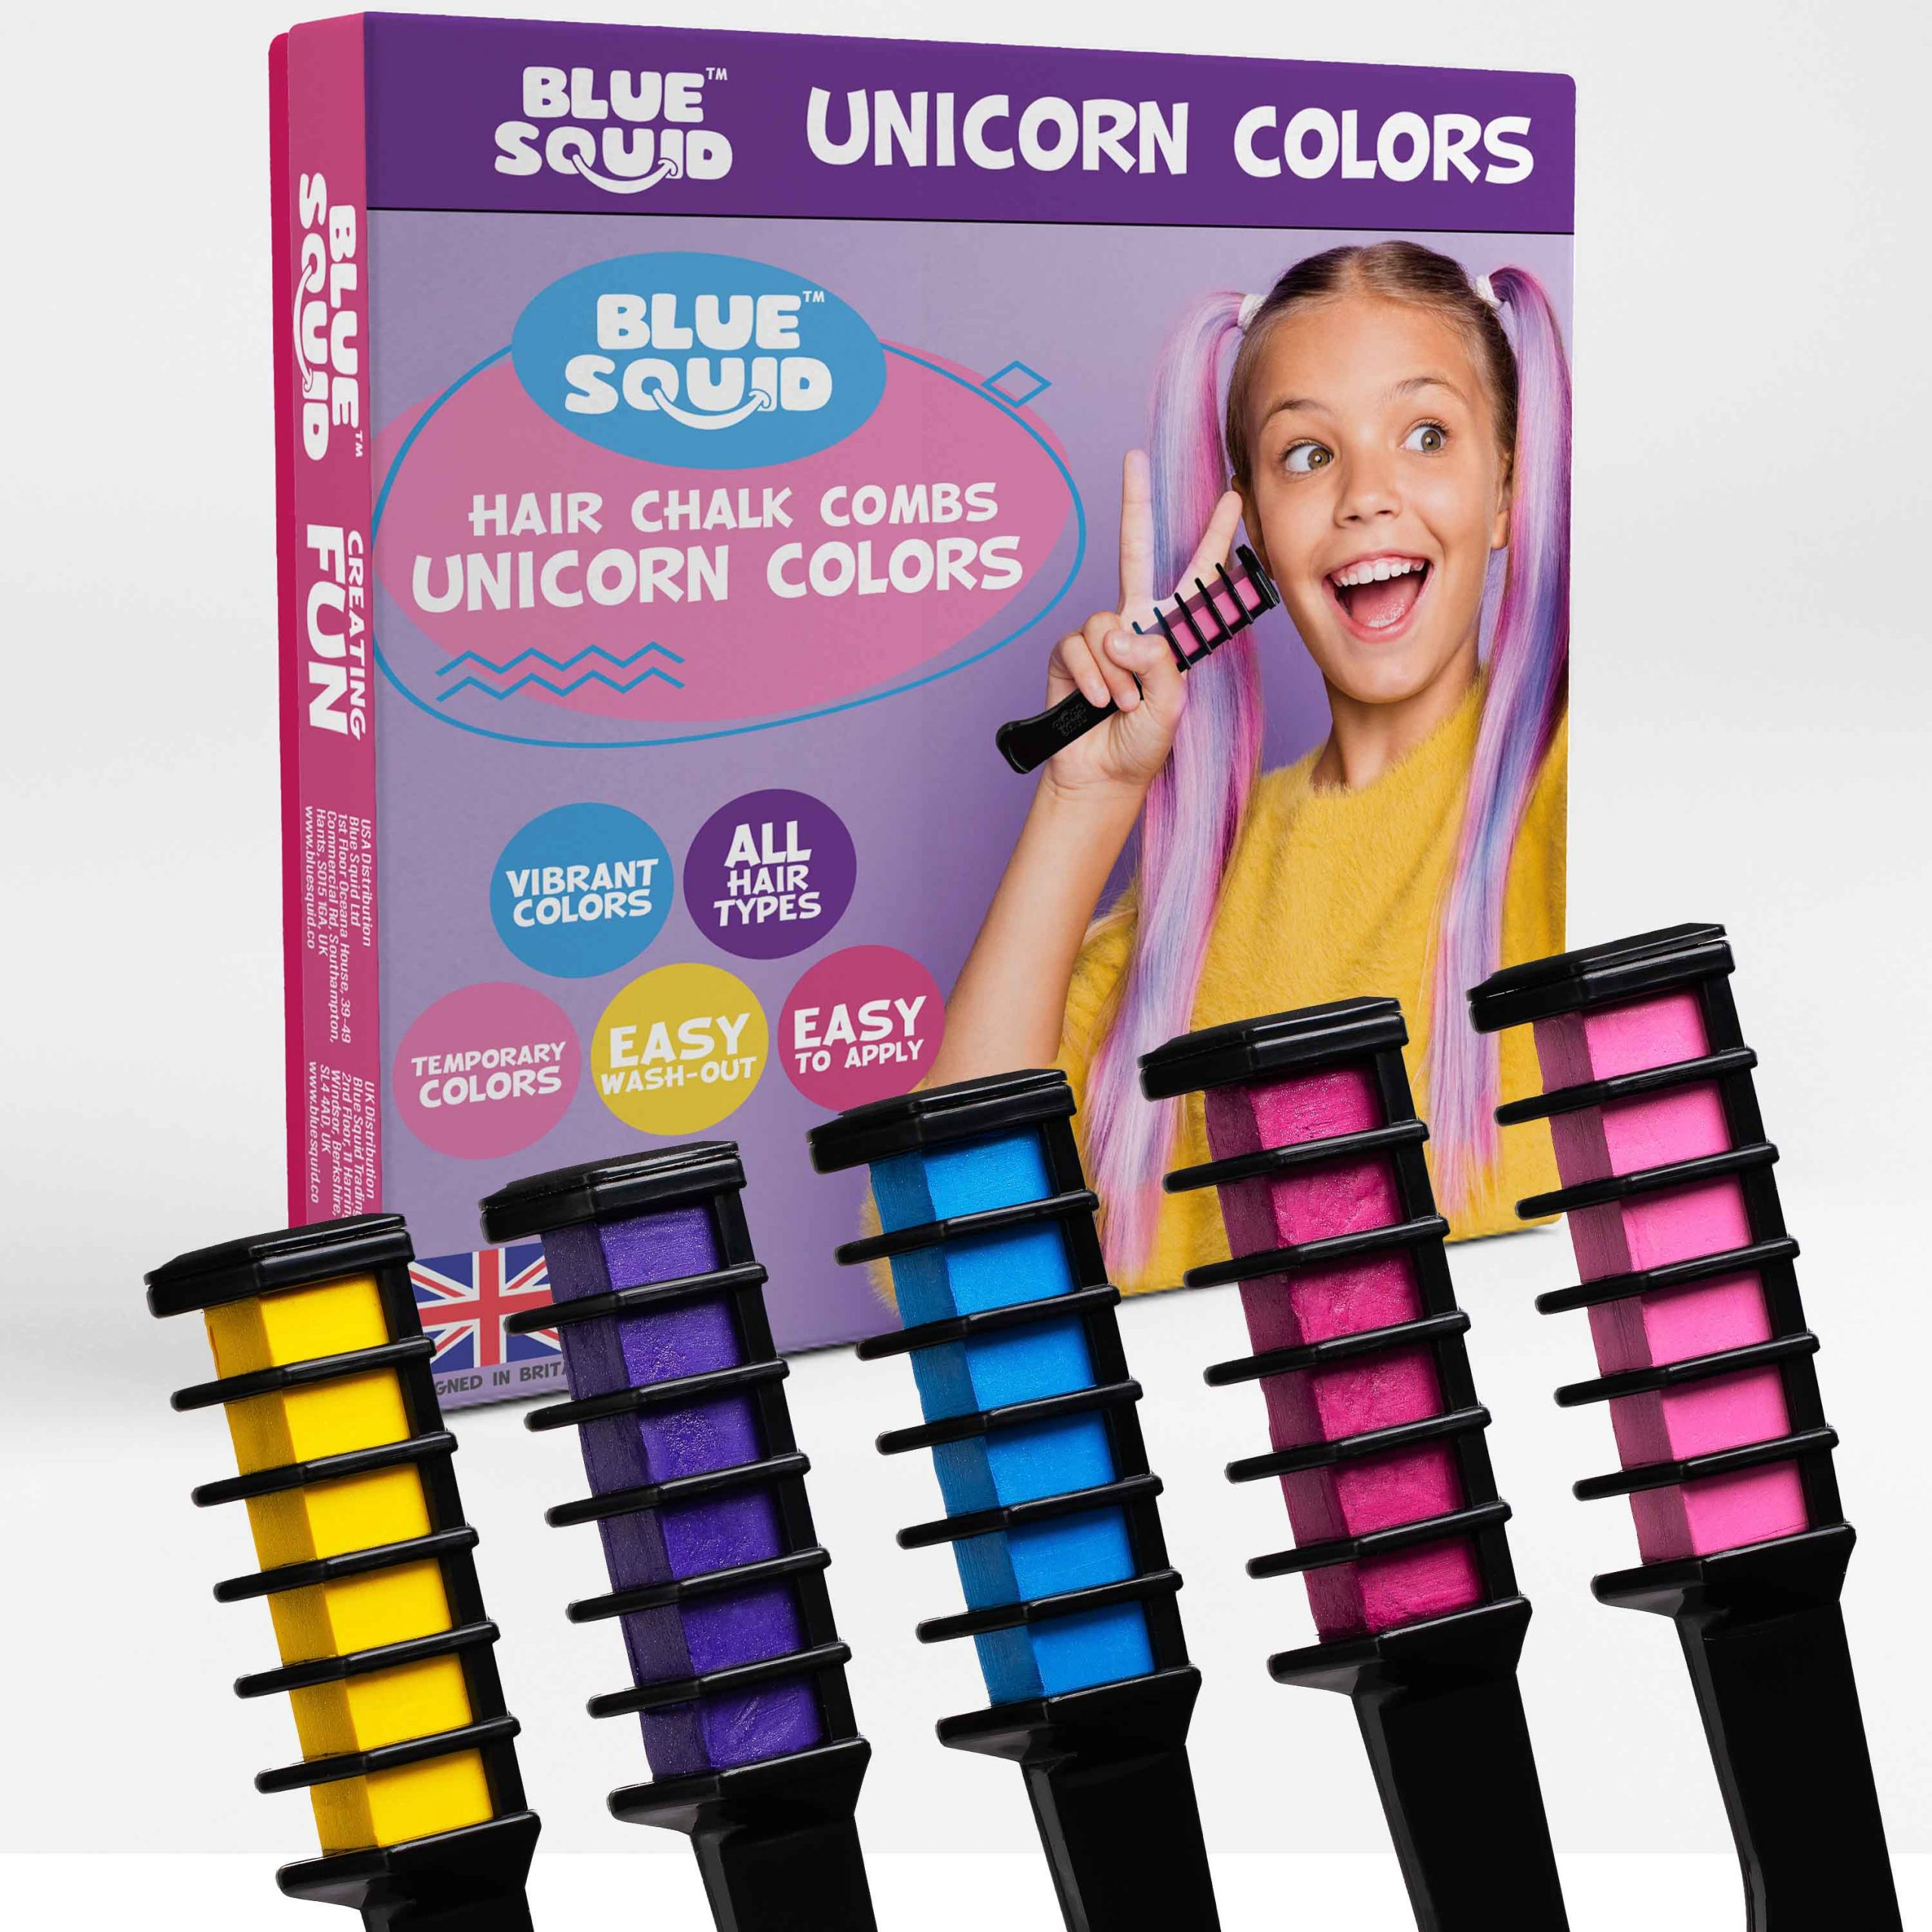 Unicorn Hair Chalk Combs